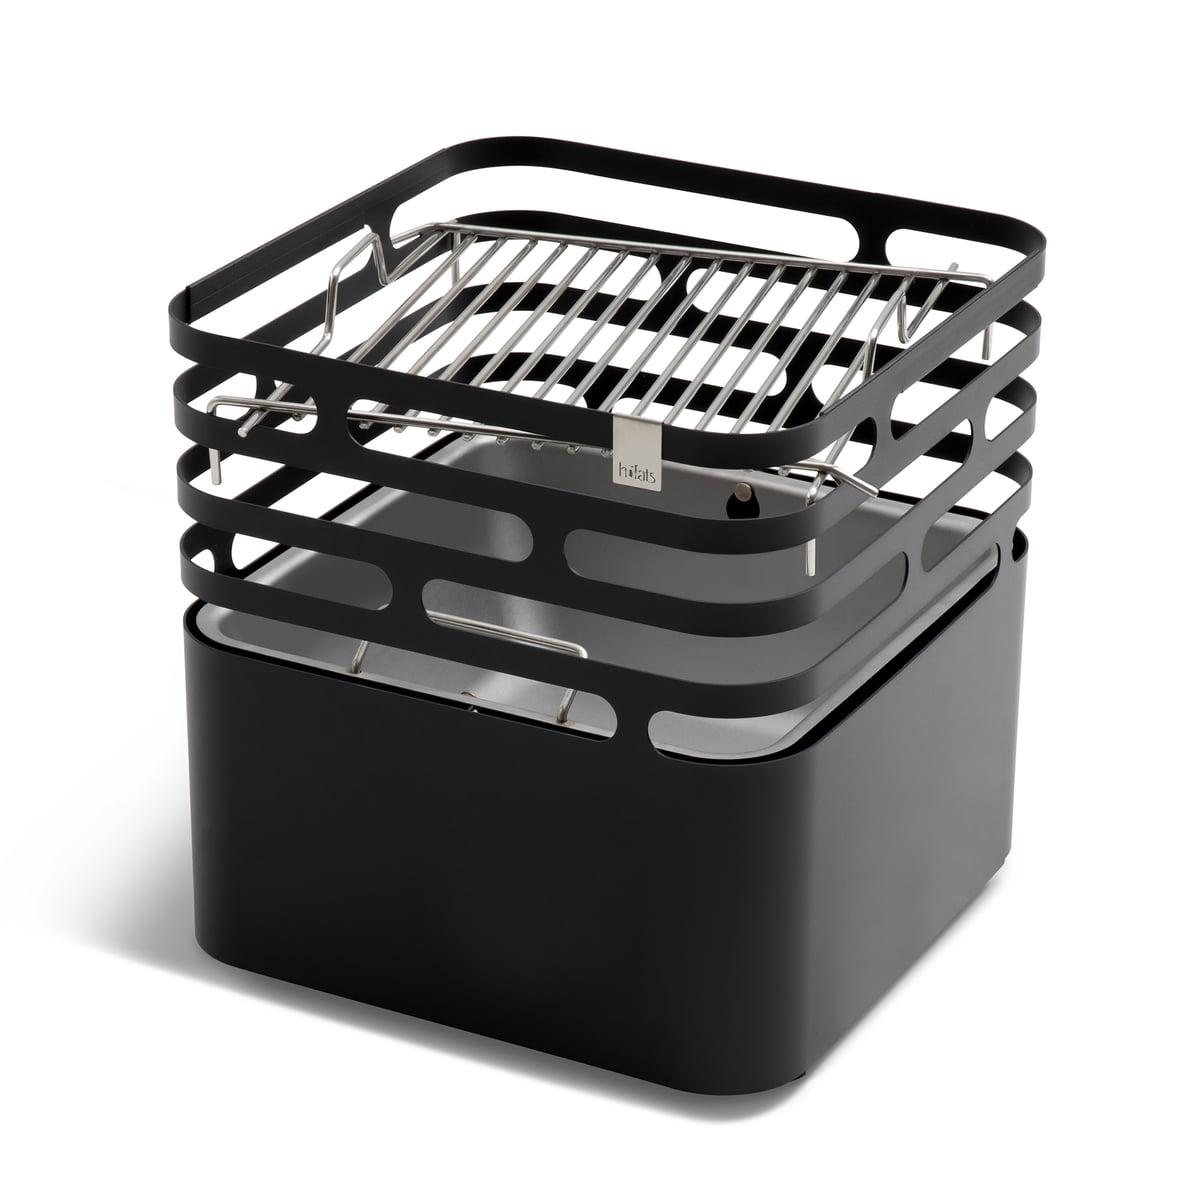 cube fire basket by h fats online shop connox. Black Bedroom Furniture Sets. Home Design Ideas